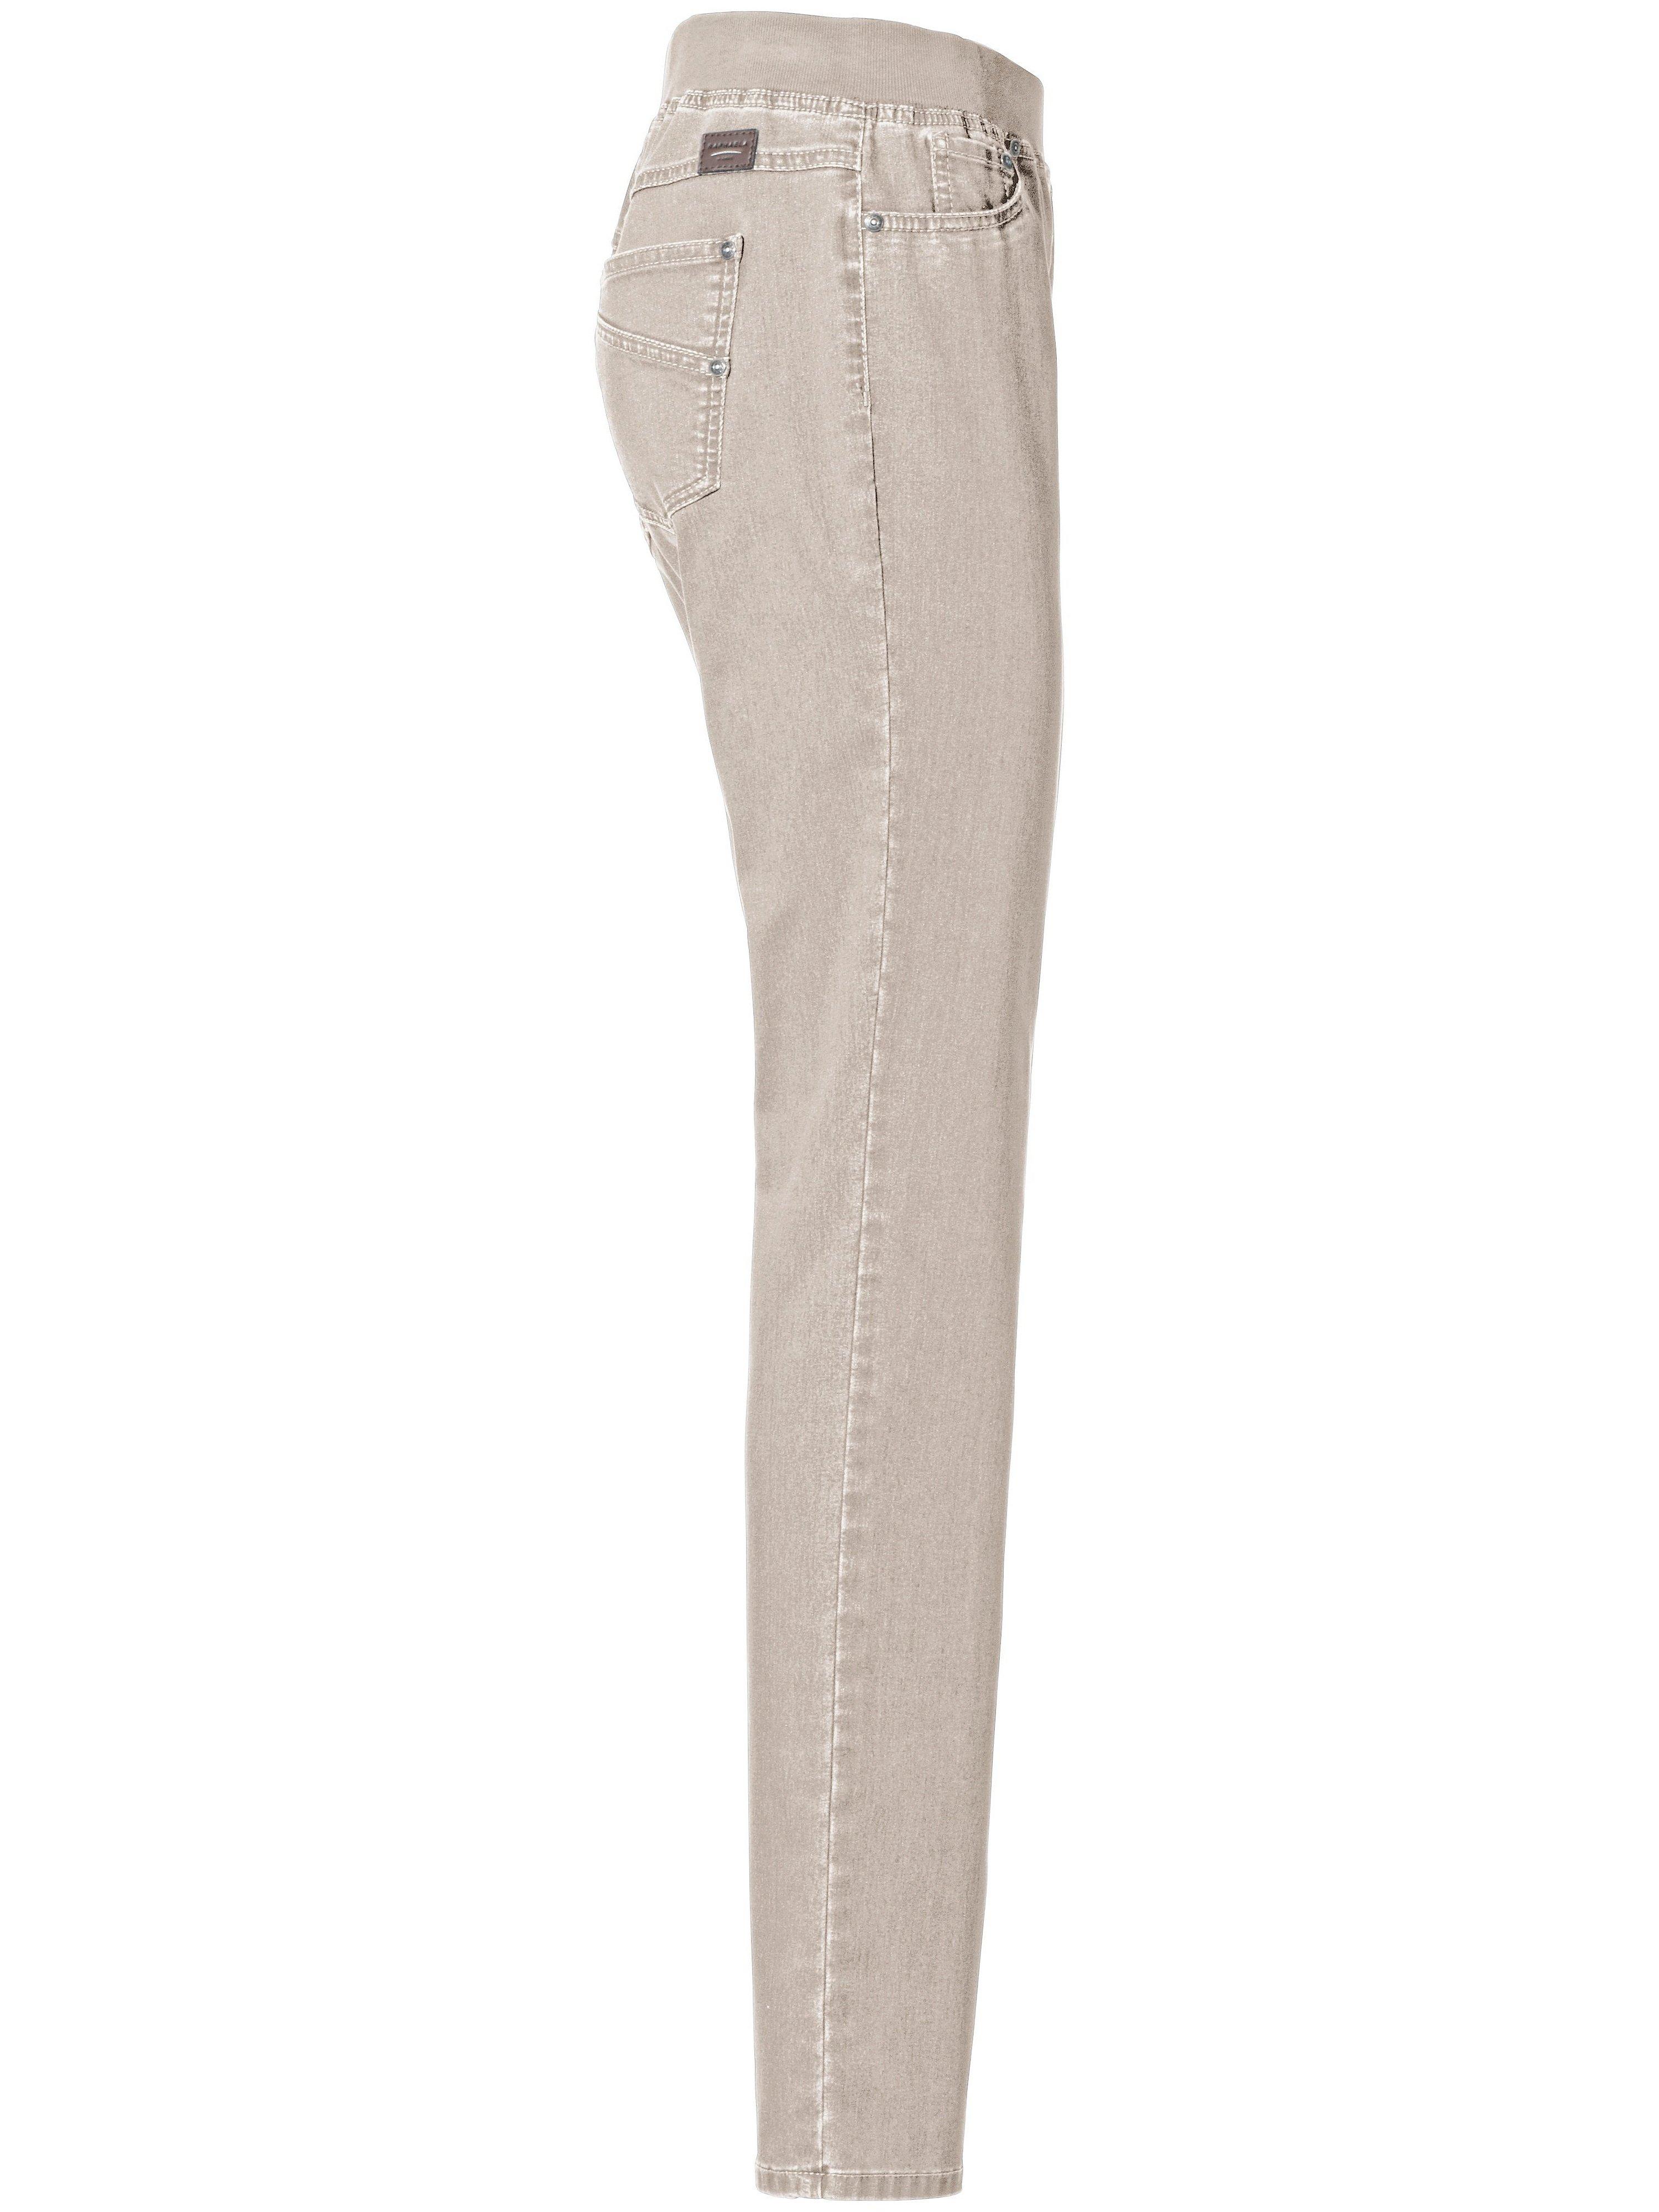 ProForm Slim-jeans model Pamina Fra Raphaela by Brax denim